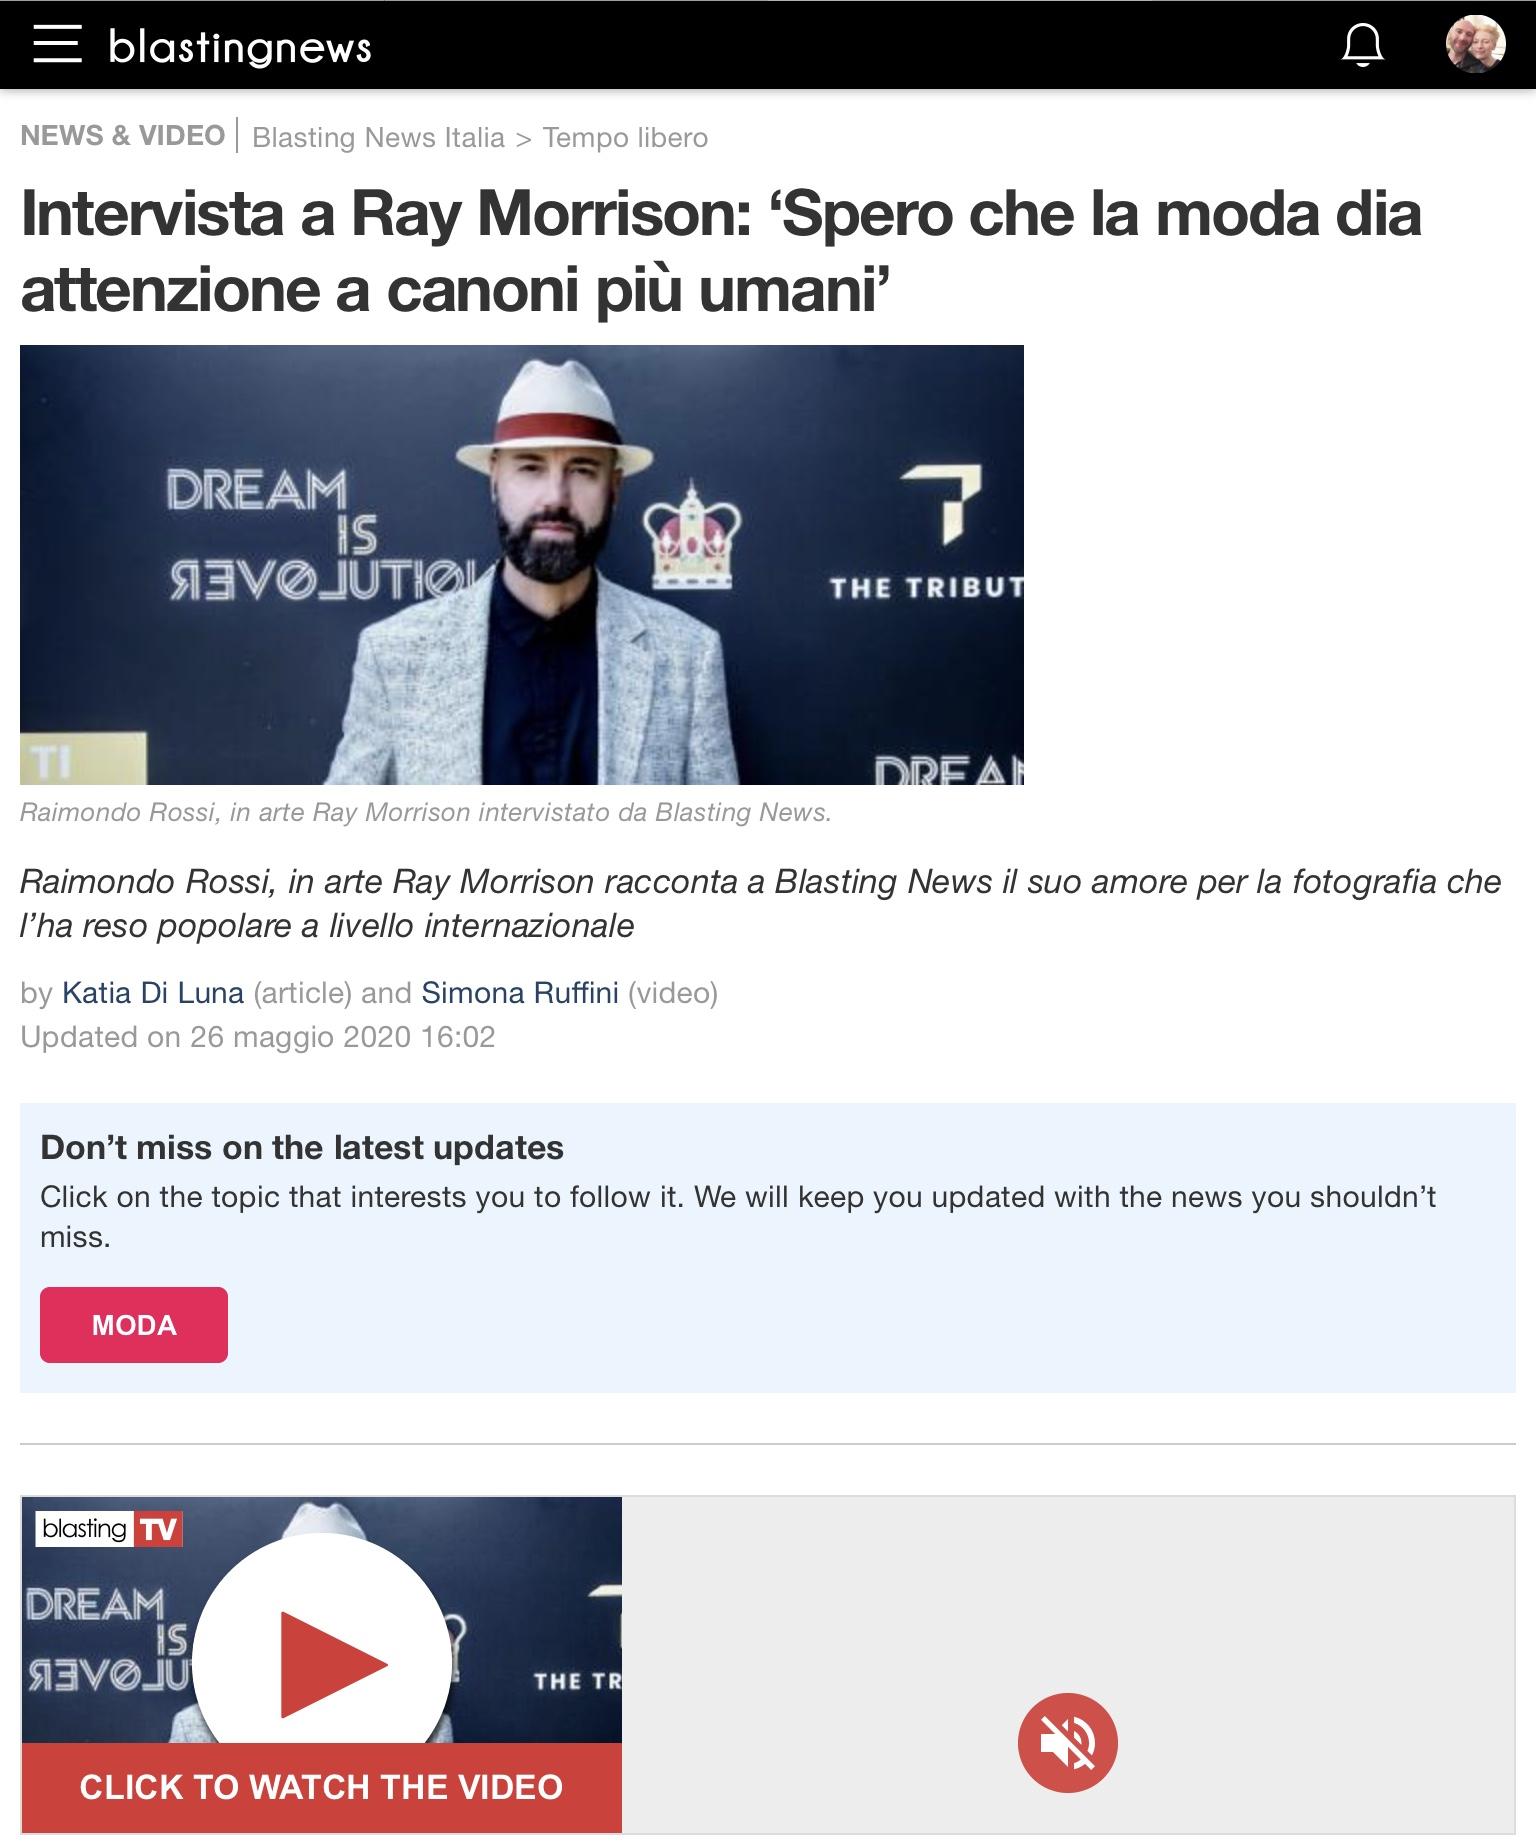 Raimondo Rossi Ray Morrison Blasting News